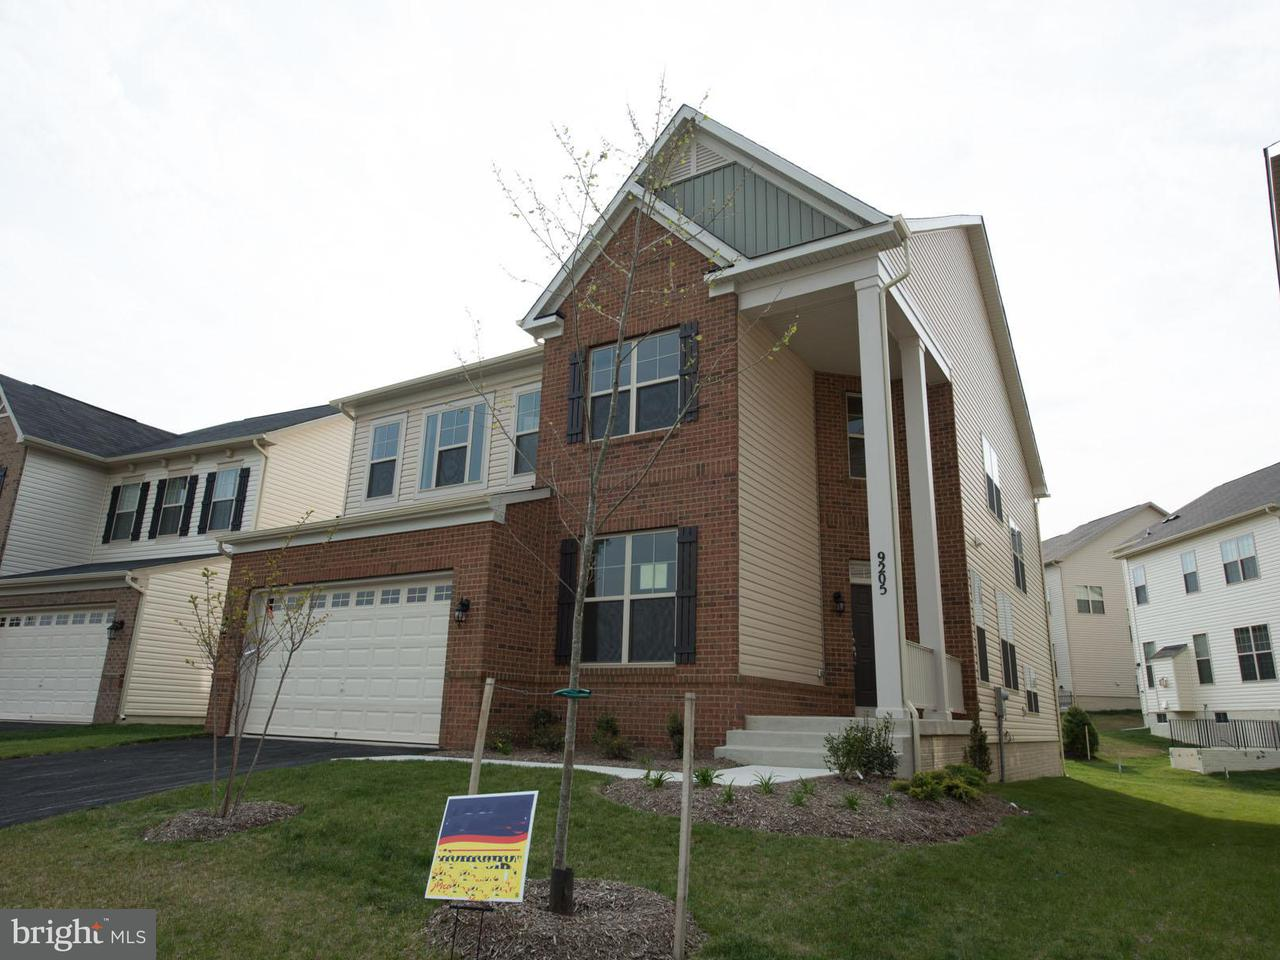 Villa per Vendita alle ore 2509 SIR MICHAEL Place 2509 SIR MICHAEL Place Glenarden, Maryland 20706 Stati Uniti